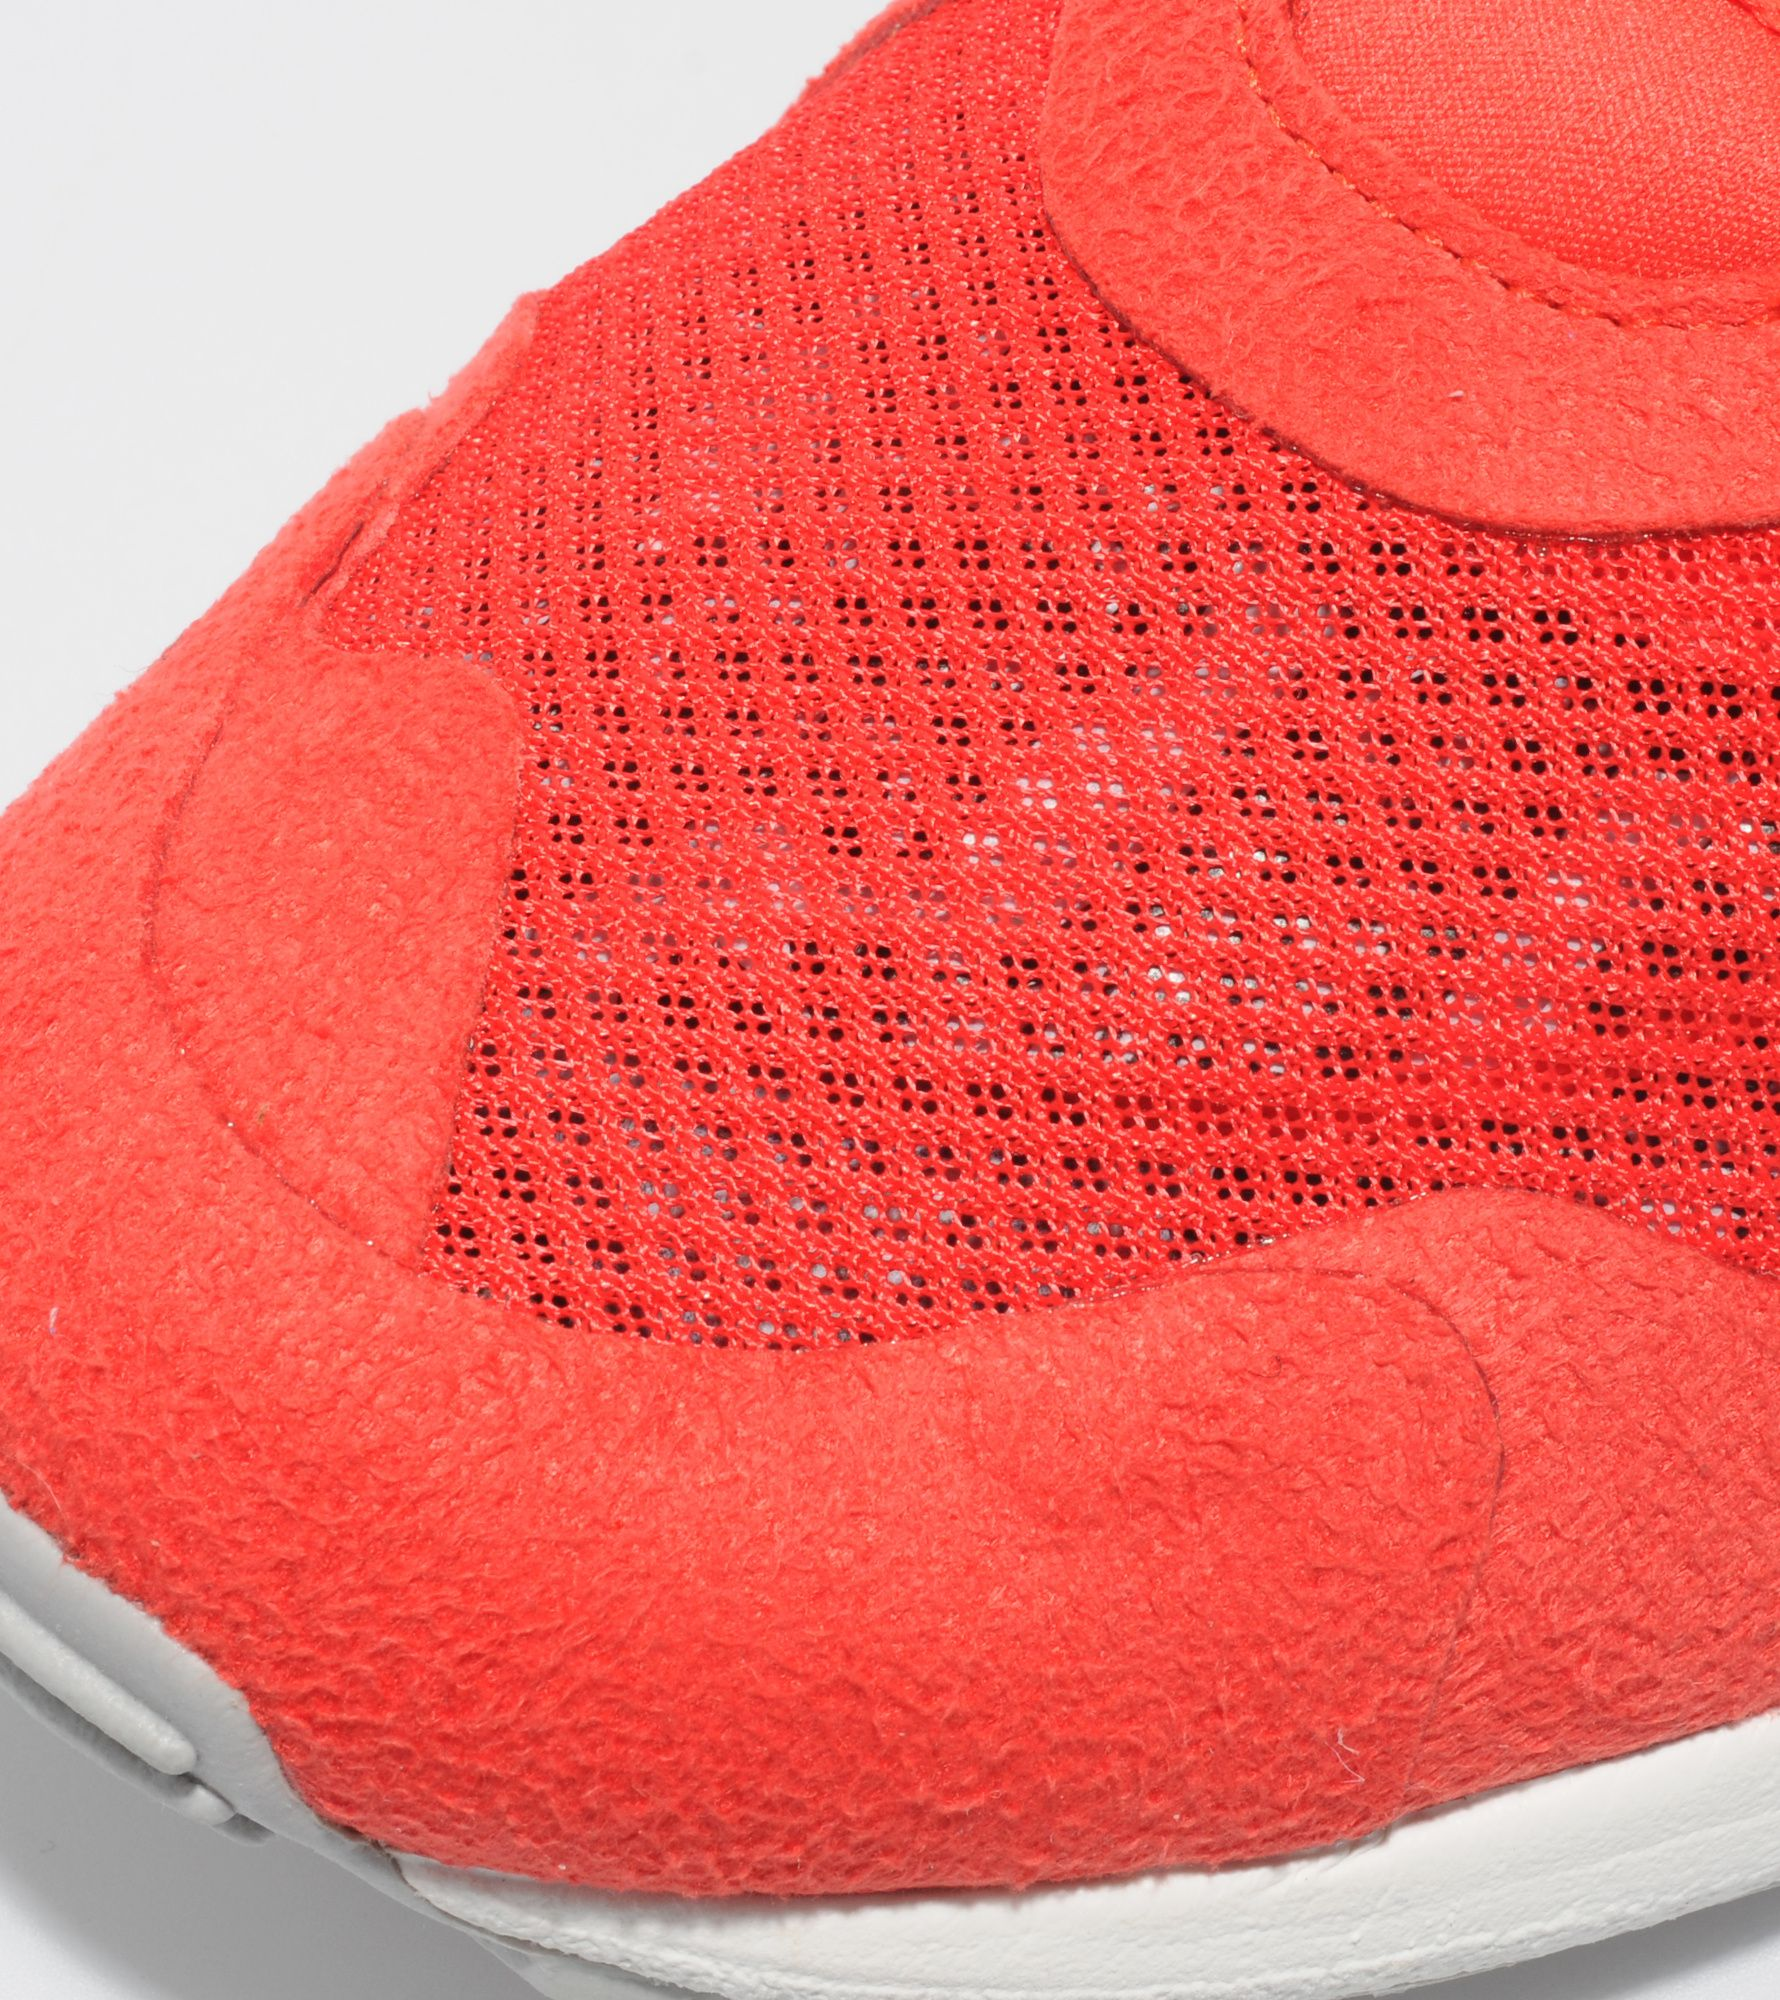 adidas Originals ZX5000 Response 'Run Thru Time 90's Pack'